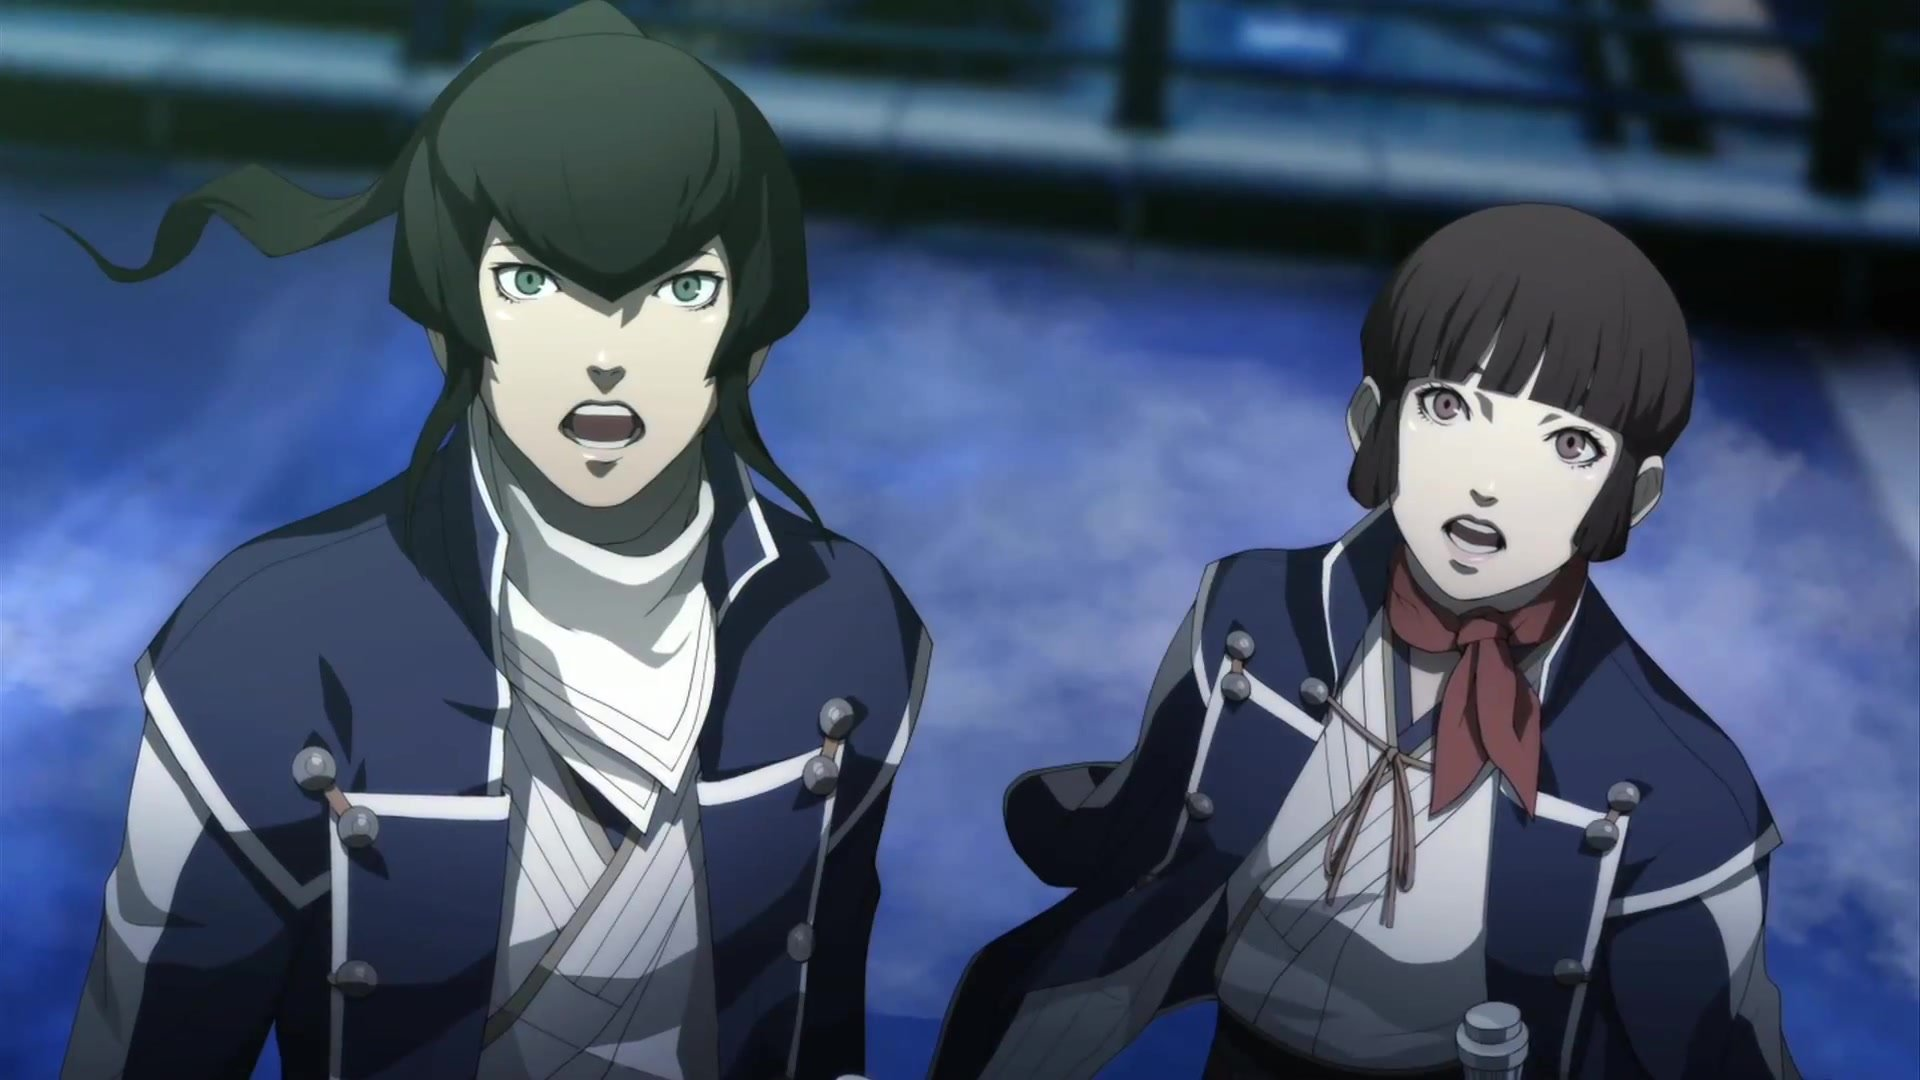 Sega reveals Persona sales beat Shin Megami Tensei, and other interesting figures screenshot